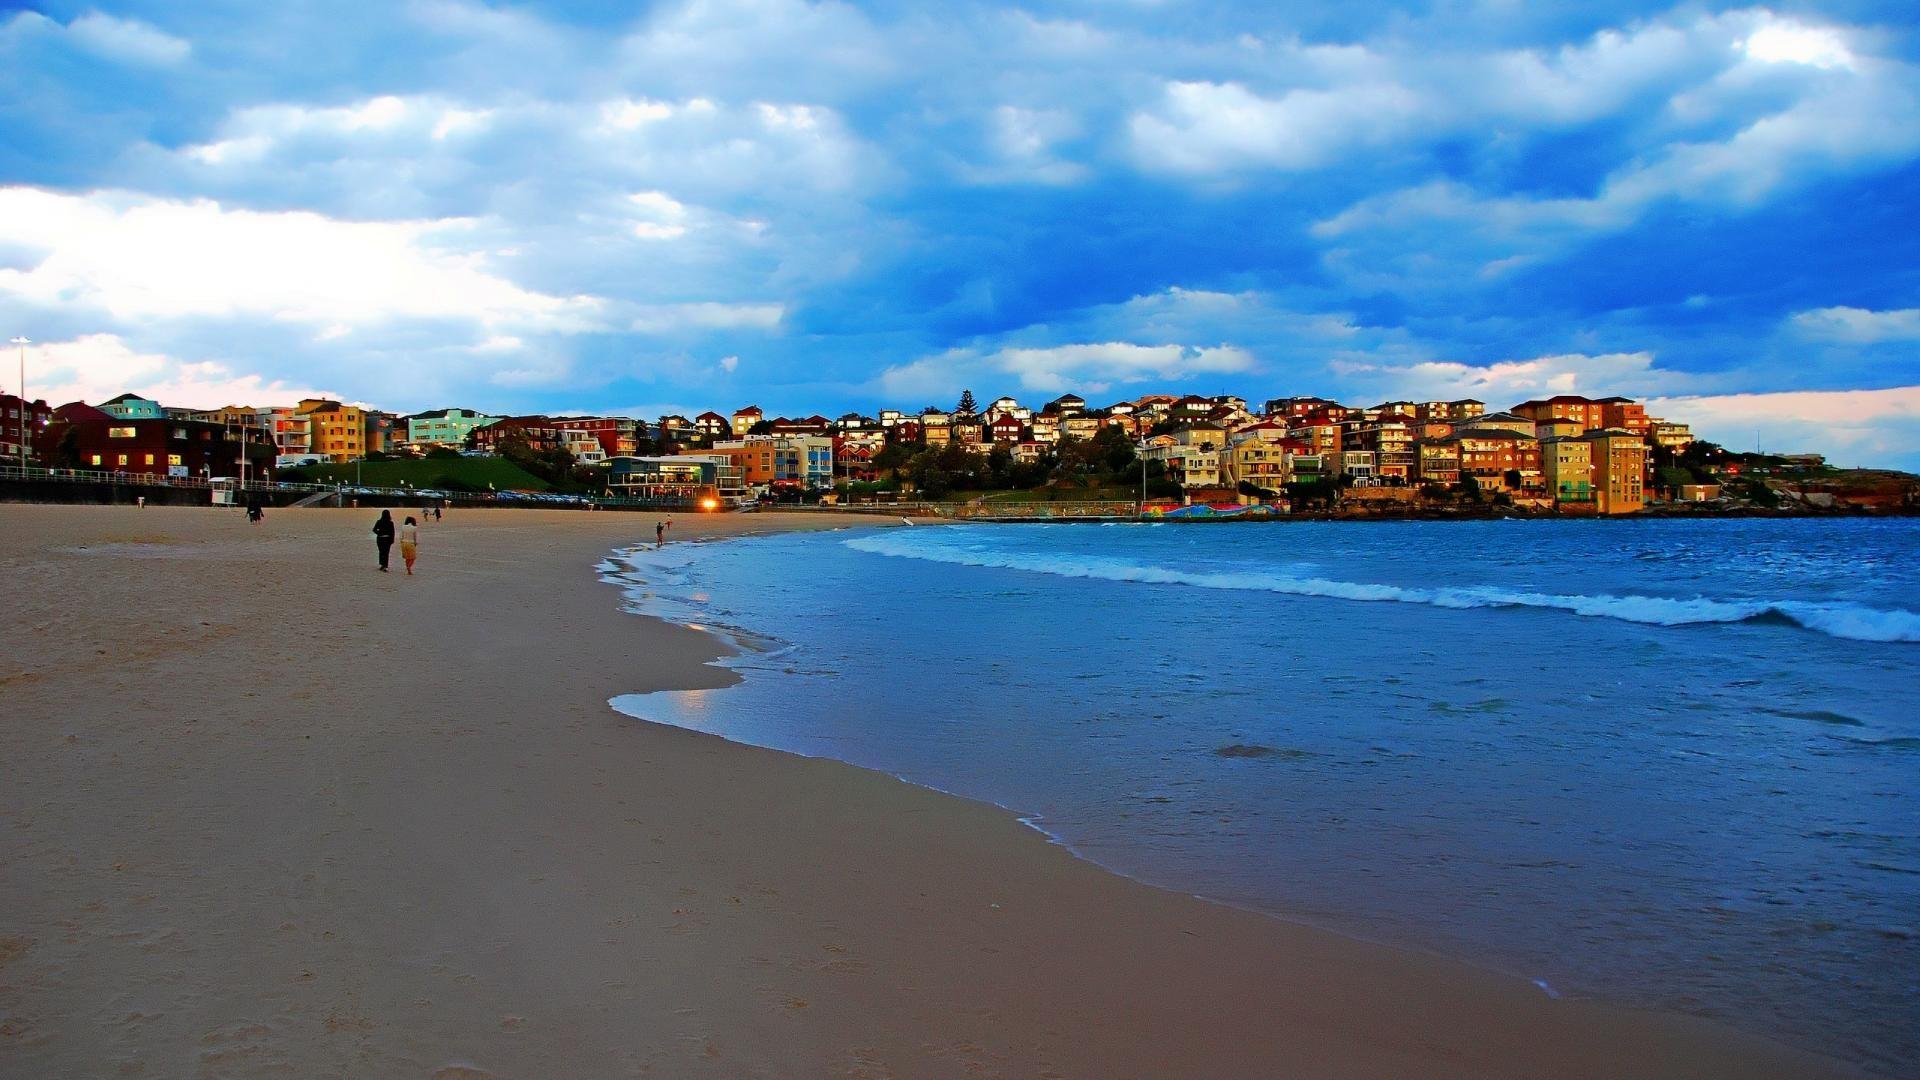 Windows 10 Wallpaper Beach Mywallpapers Site Bondi Beach Sydney Beach Wallpaper Bondi Beach